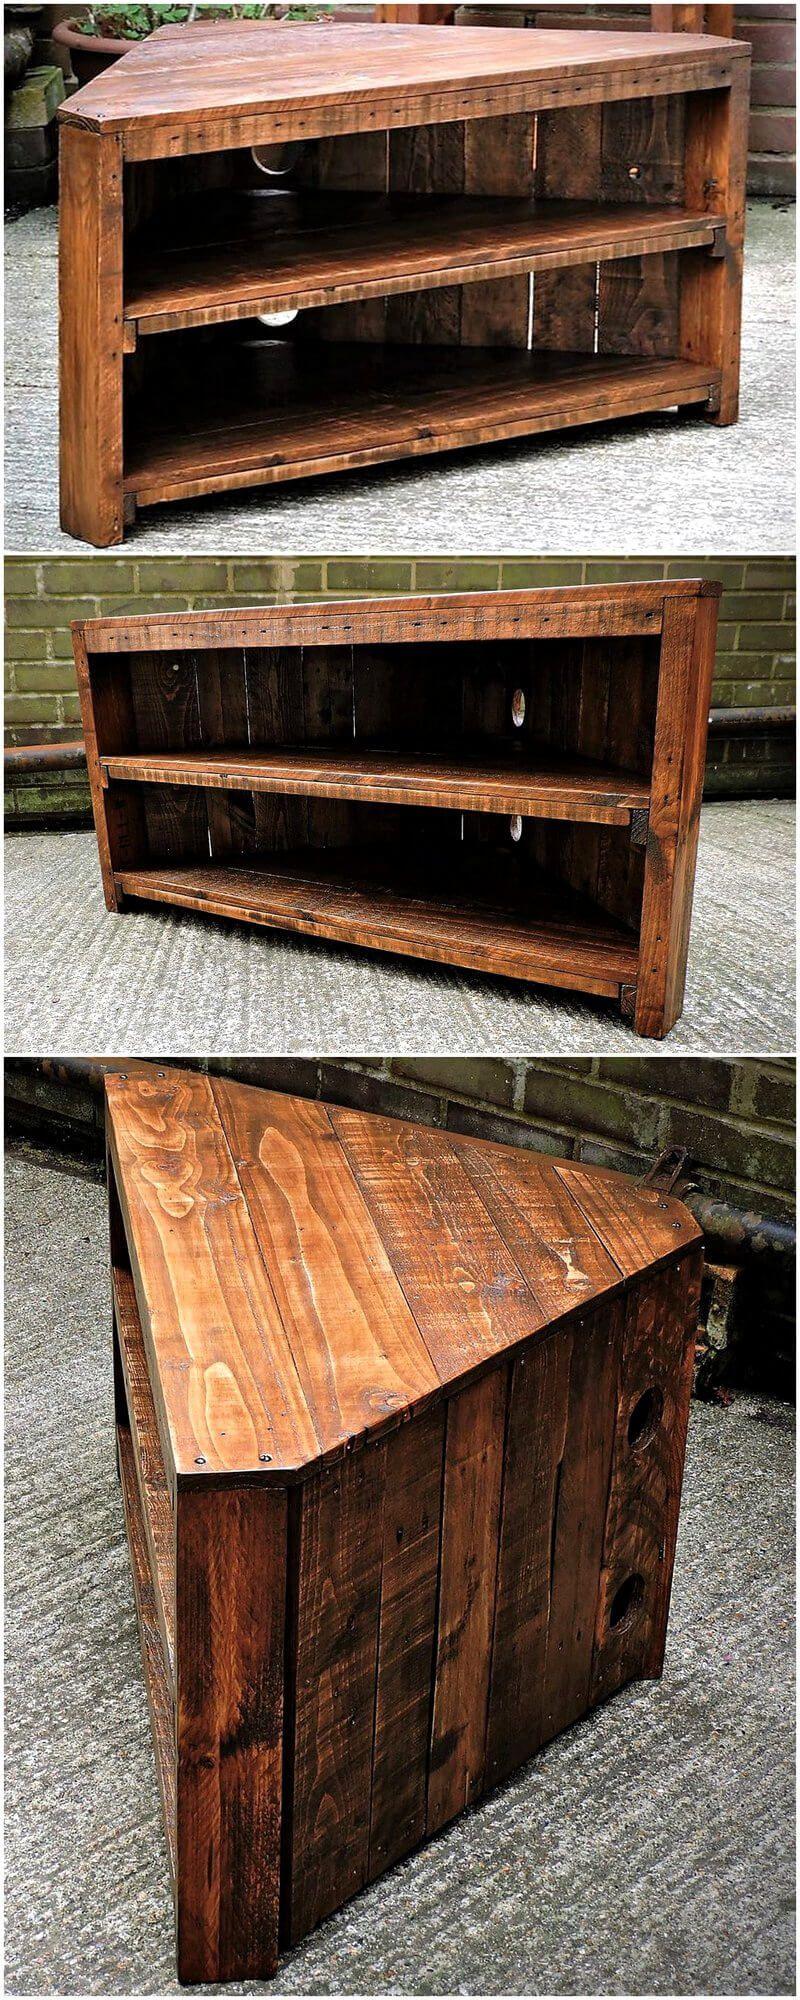 Pallets Wood Corner Tv Stand Wood Corner Tv Stand Diy Pallet Furniture Wood Pallet Furniture